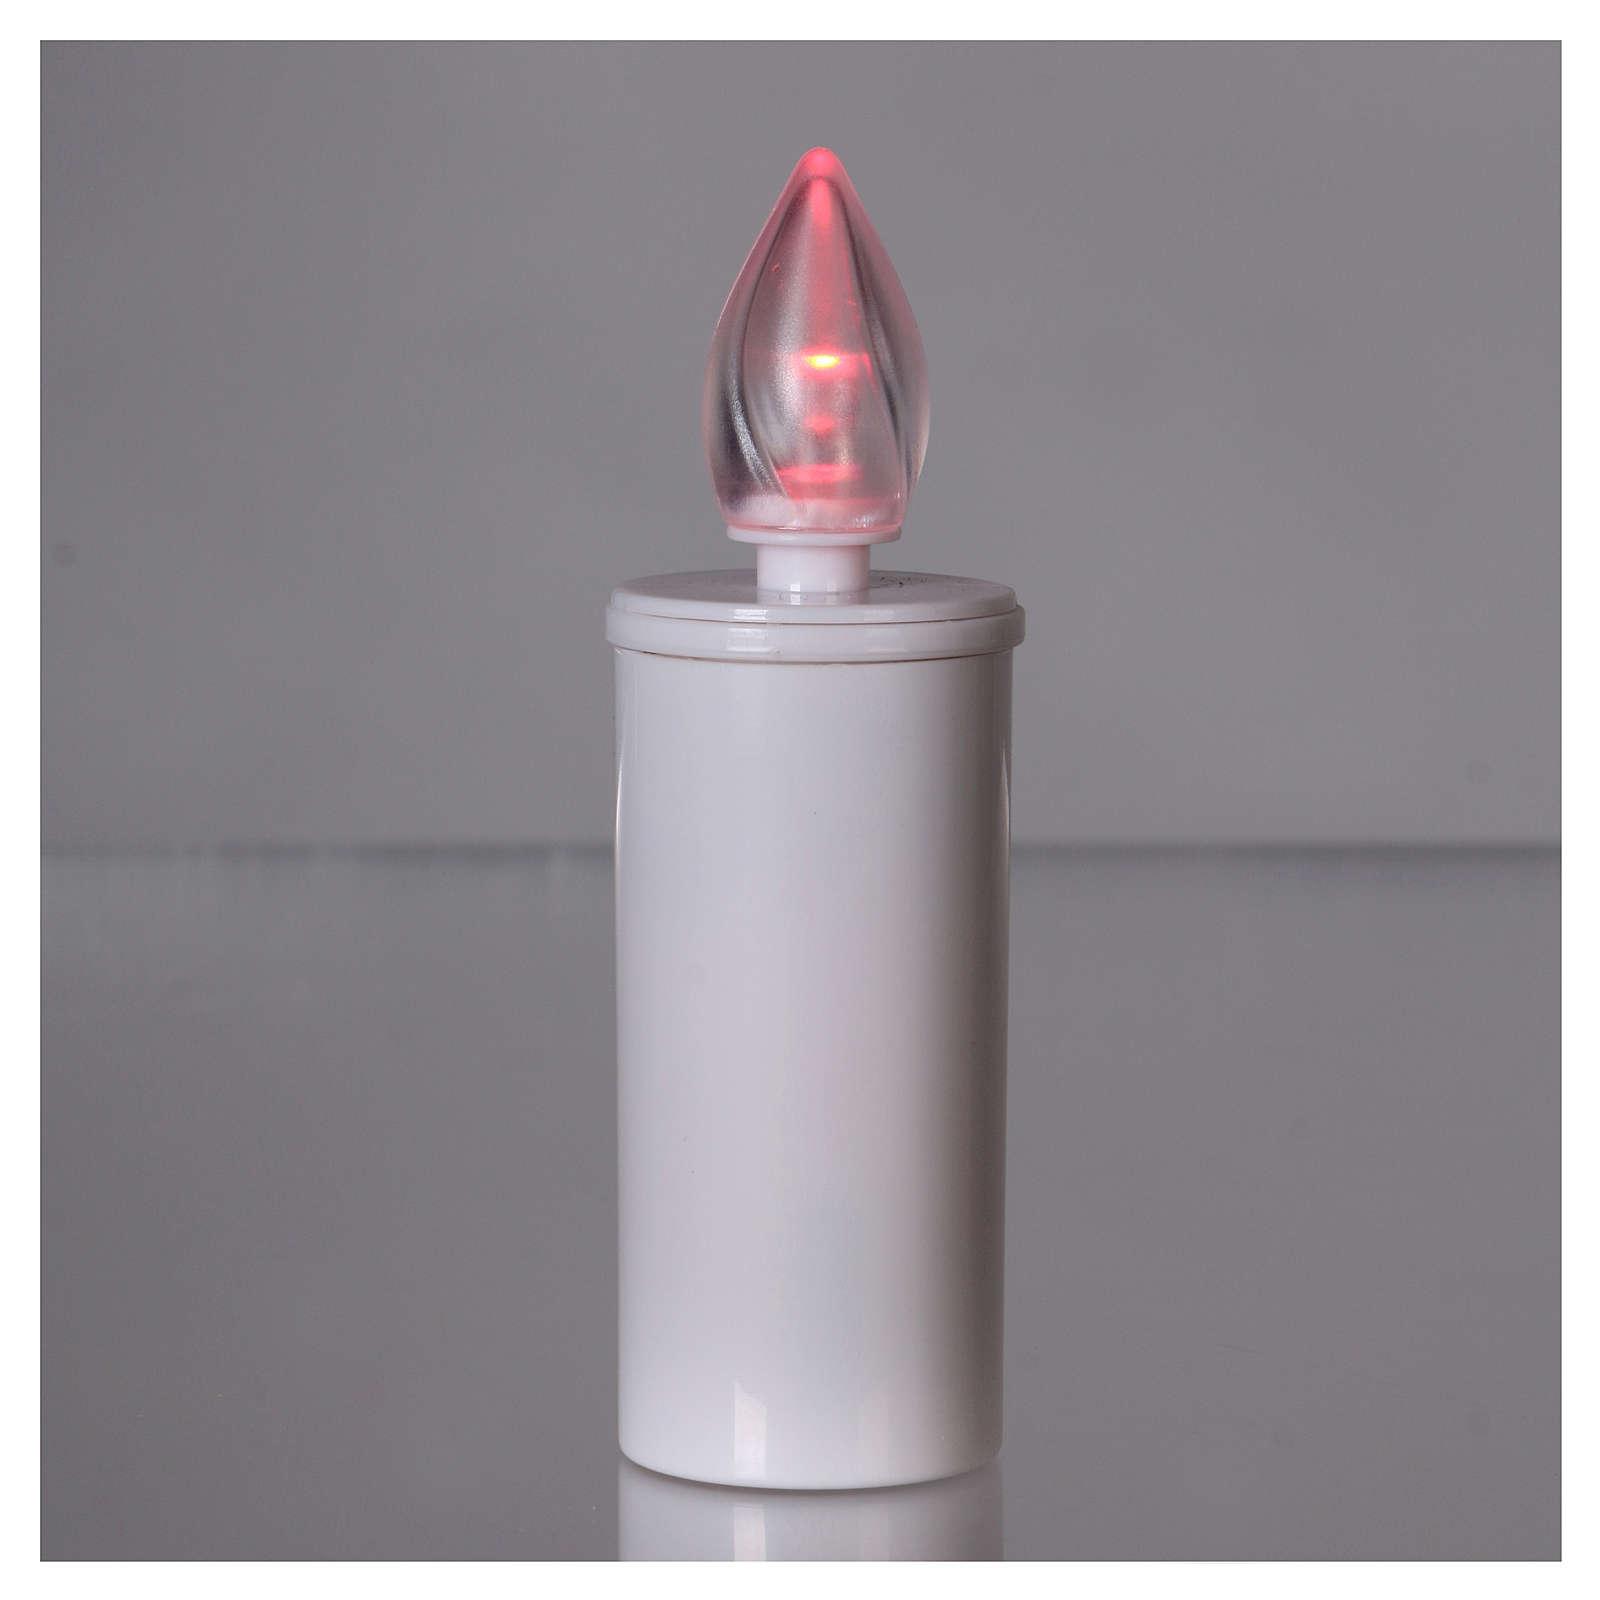 Lamparilla Lumada anual desechable luz parpadeante roja 3